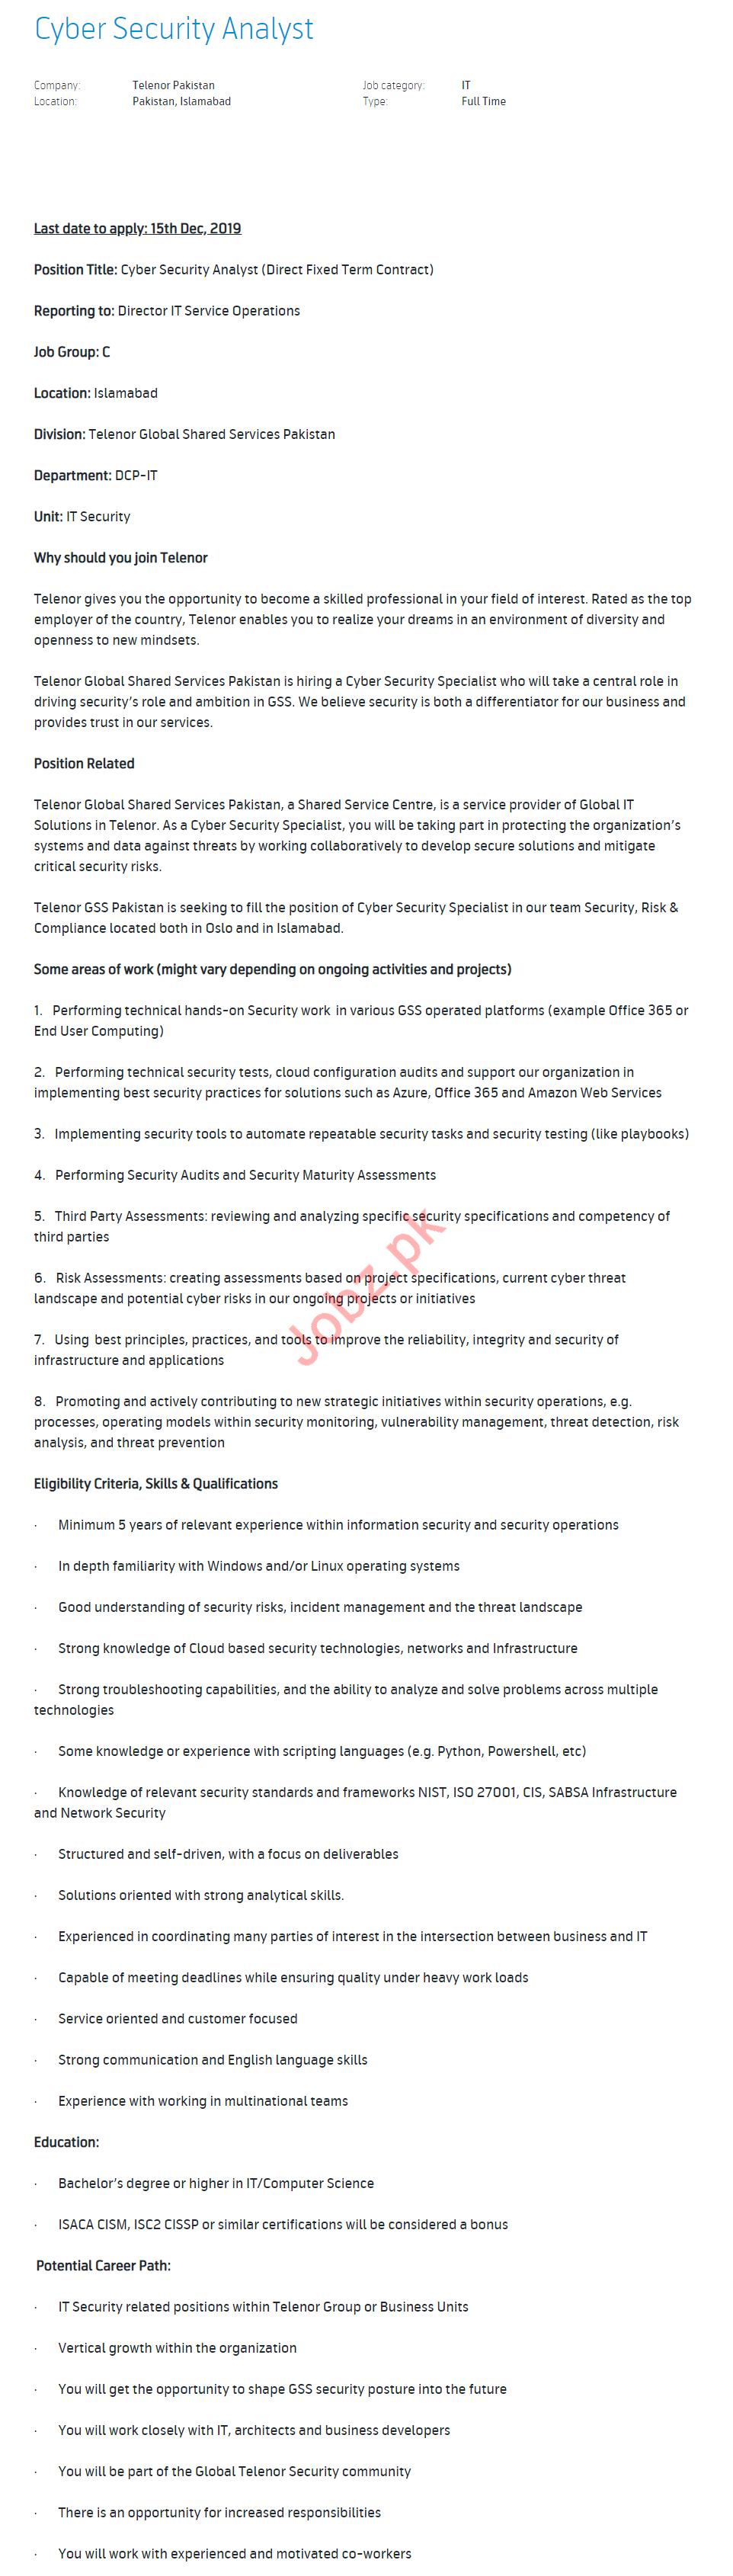 Cyber Security Analyst Jobs in Telenor Pakistan